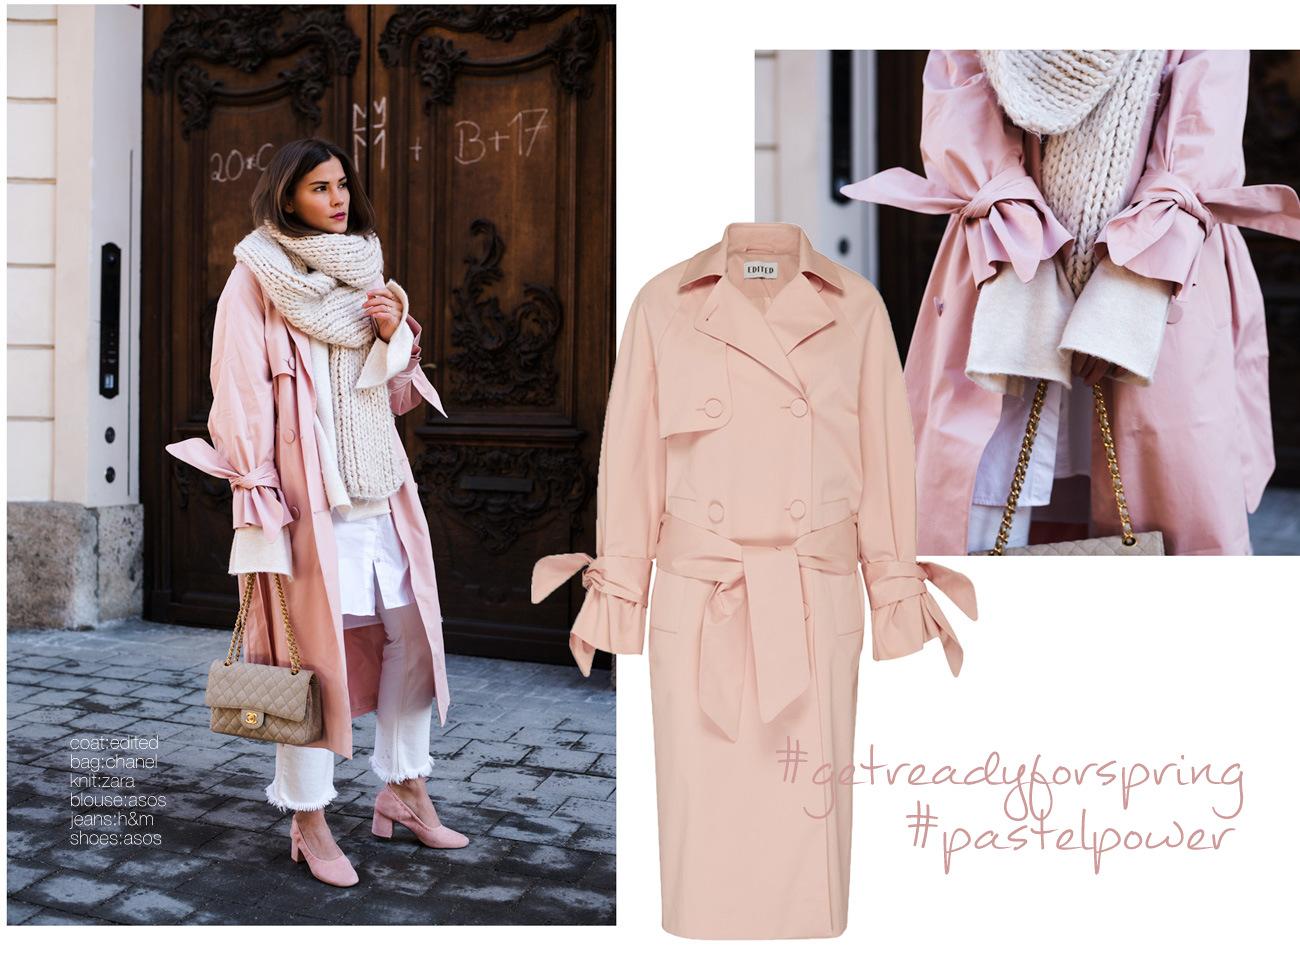 rosaner-trenchcoat-mit-trompetenärmeln-edited-the-label-blogger-it-piece-2017-chanel-2.55-stoff-fashiioncarpet